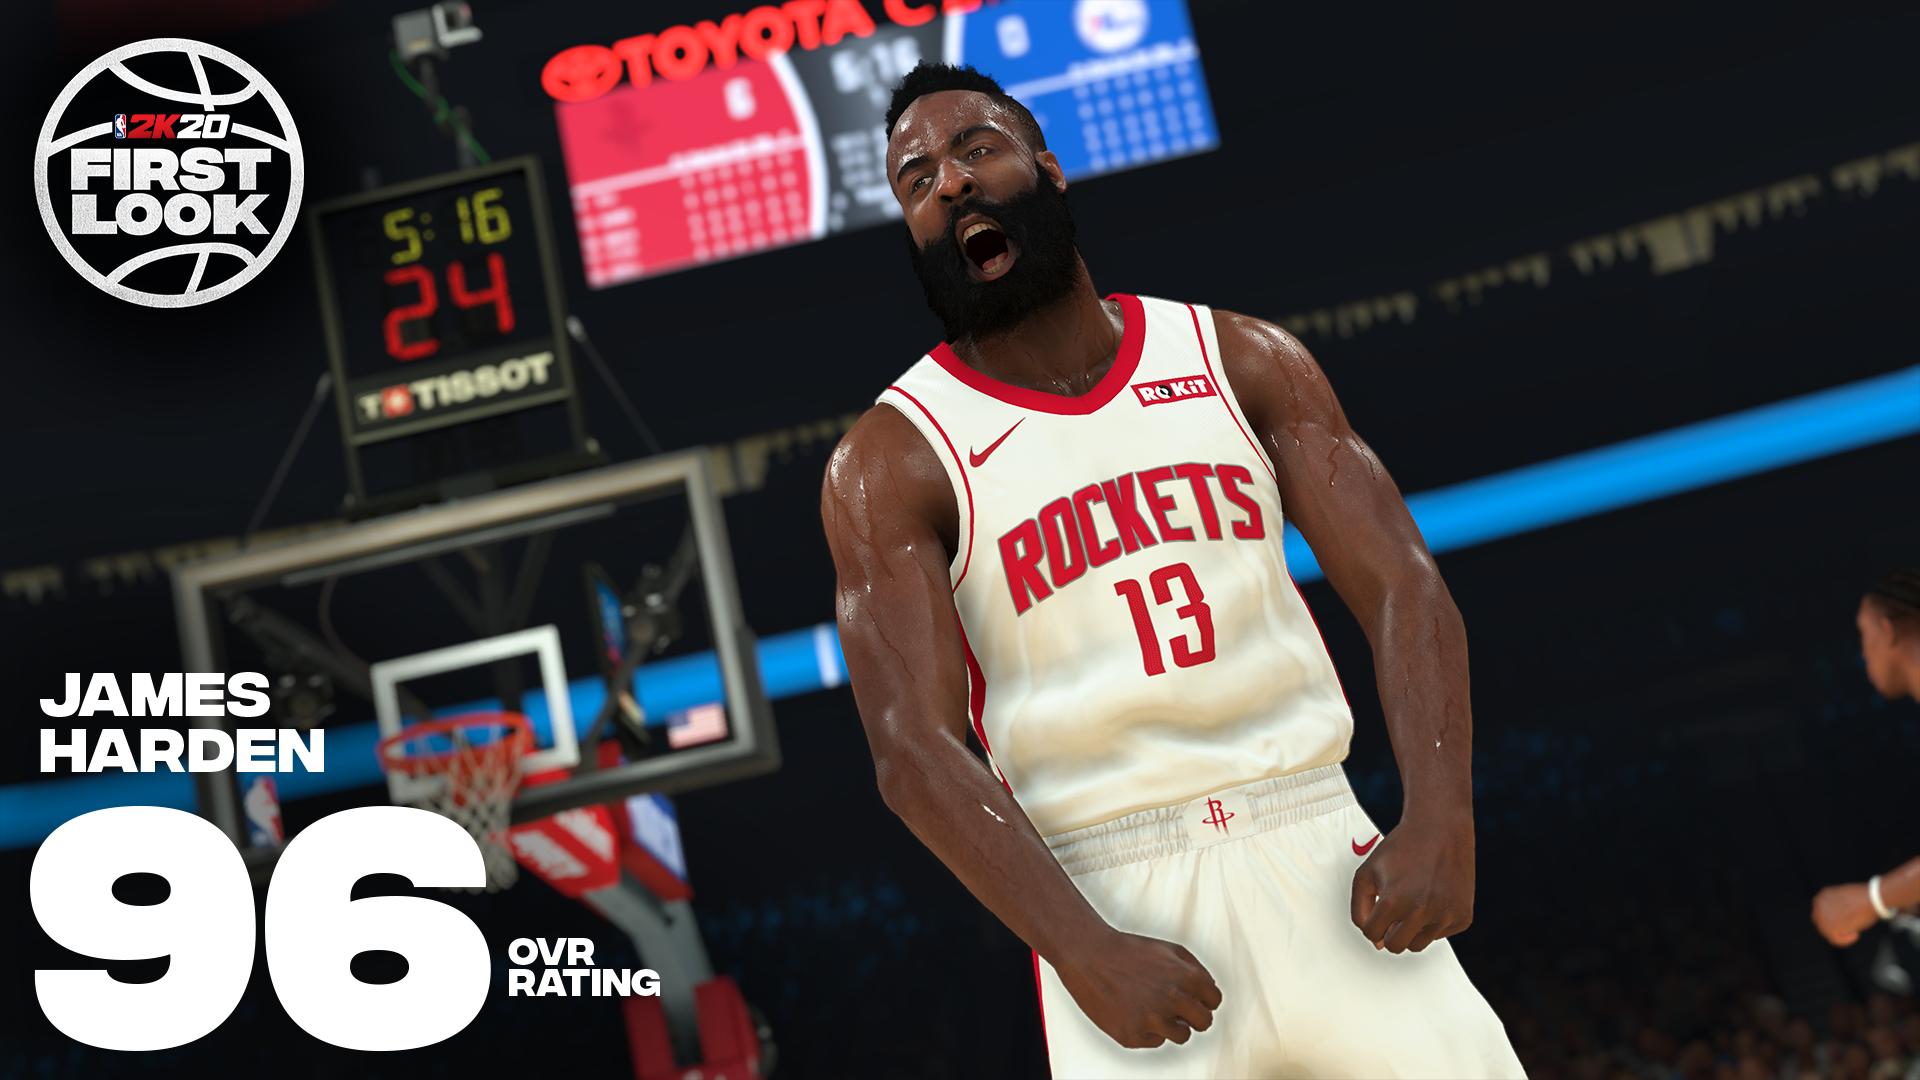 《NBA 2K20》明星球员评分公布!老詹连续10年评分最高 第8张